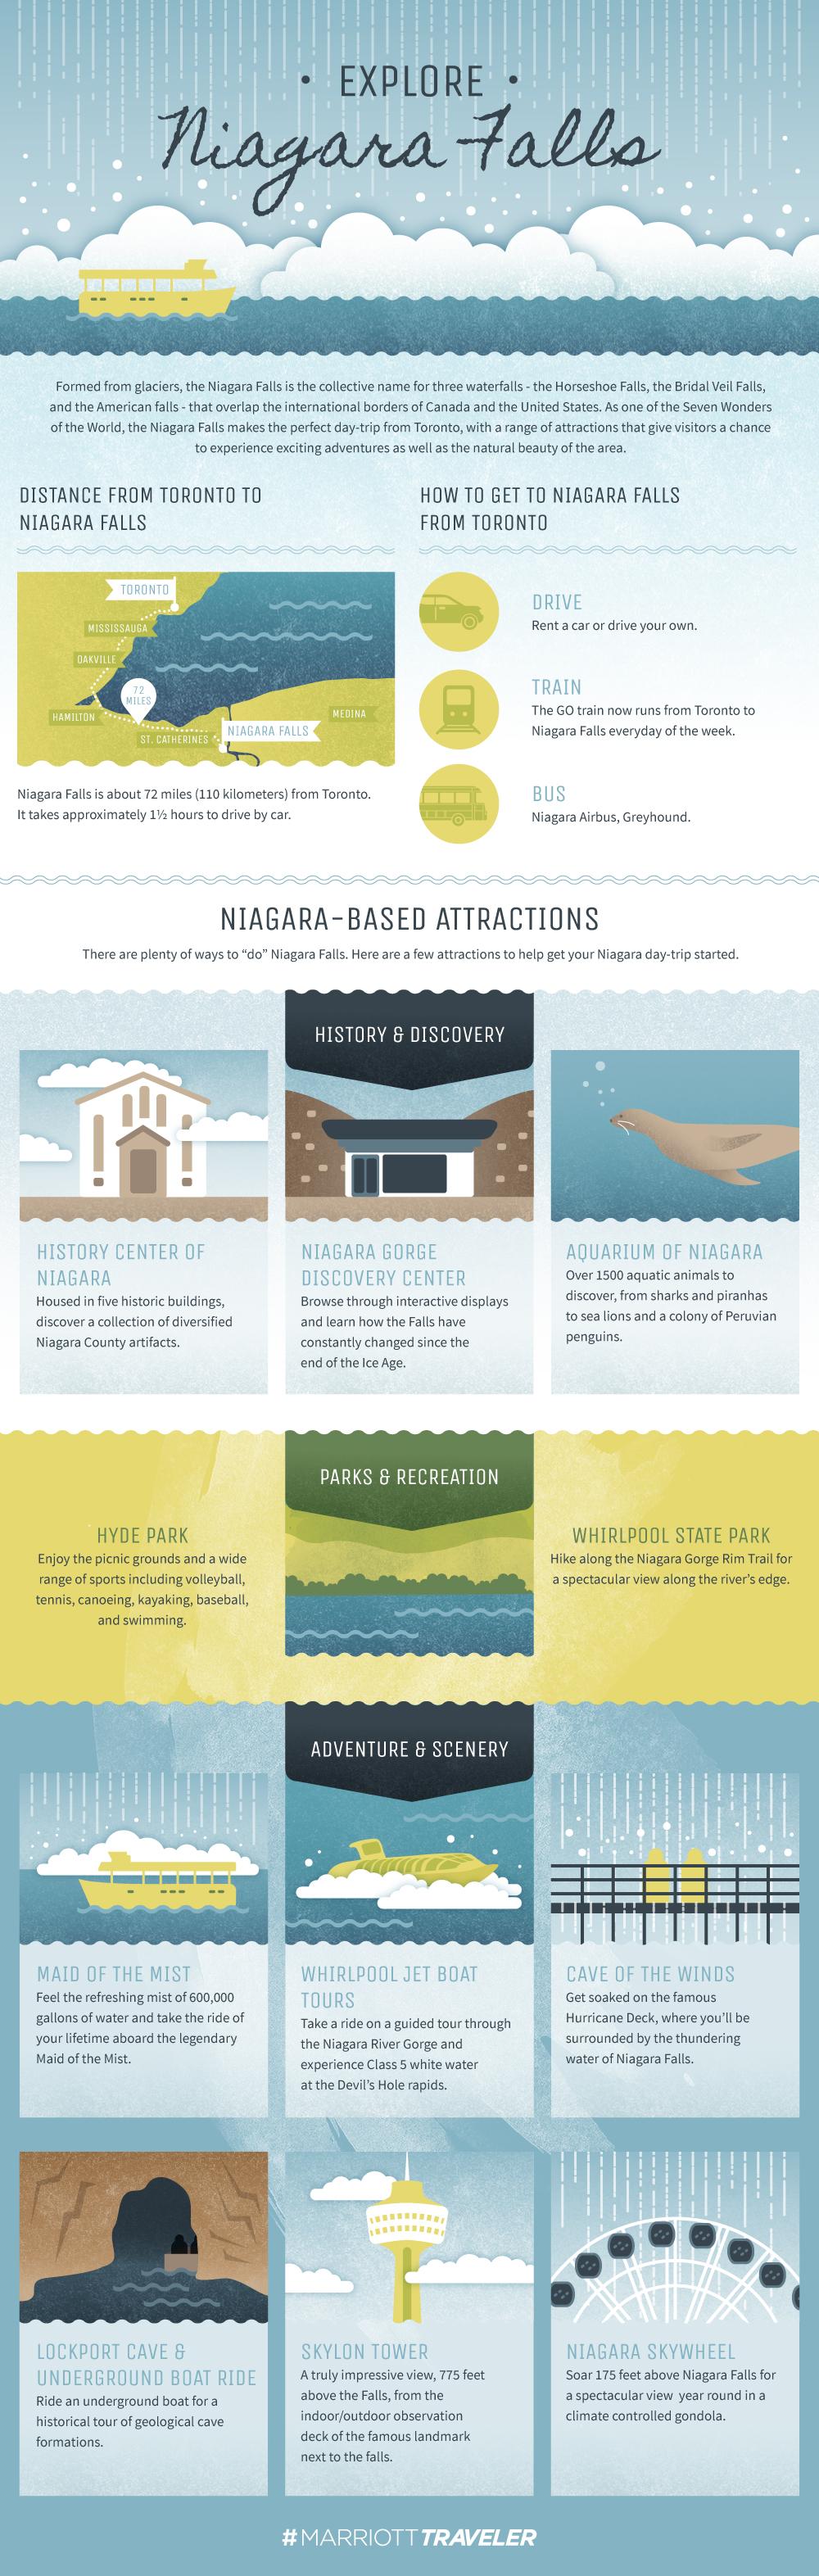 Explore Niagara Falls